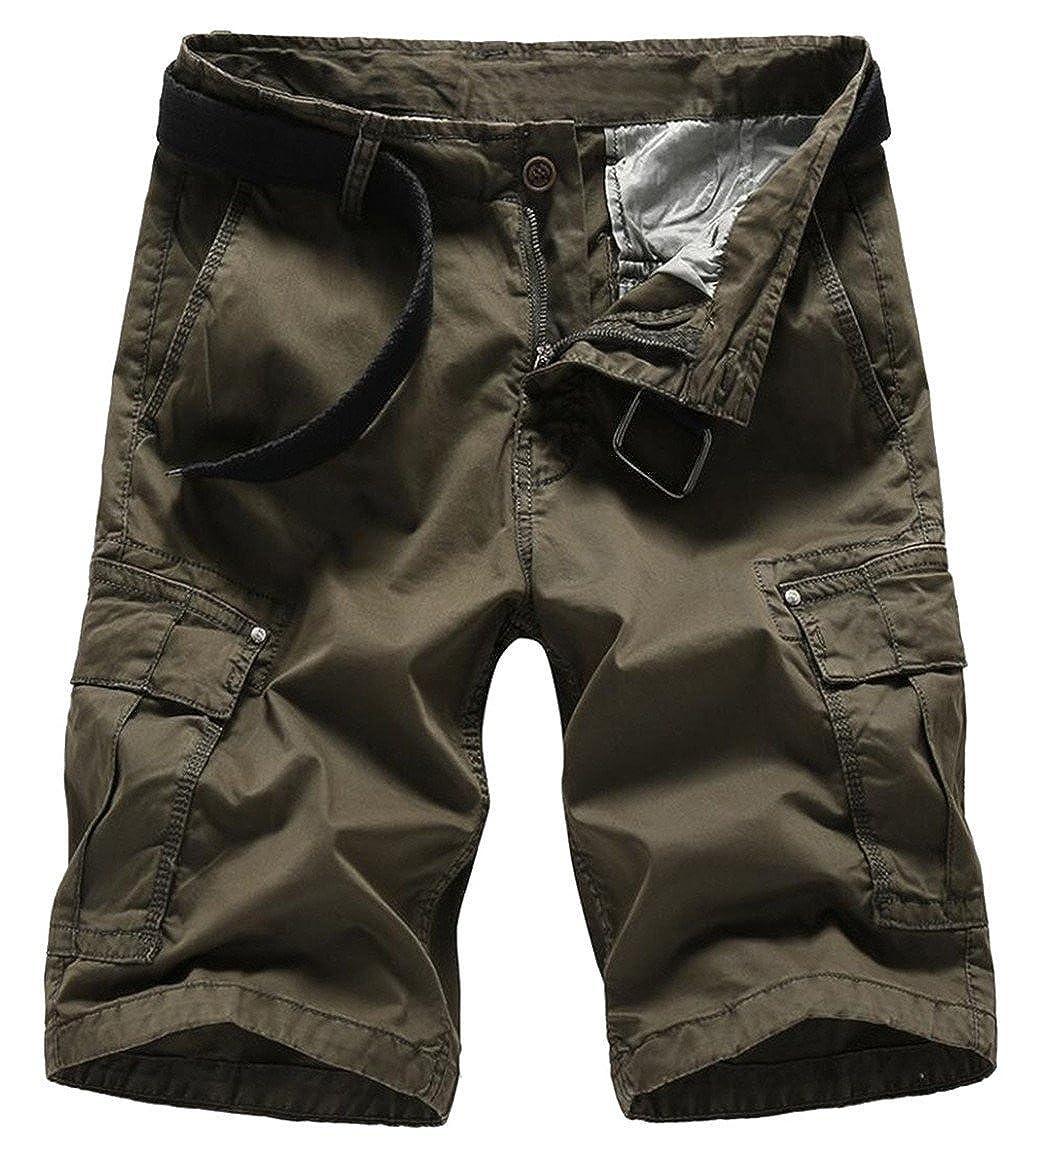 heymoneyMen heymoney Men Classic Casual Pockets Cotton Army New Short Pants